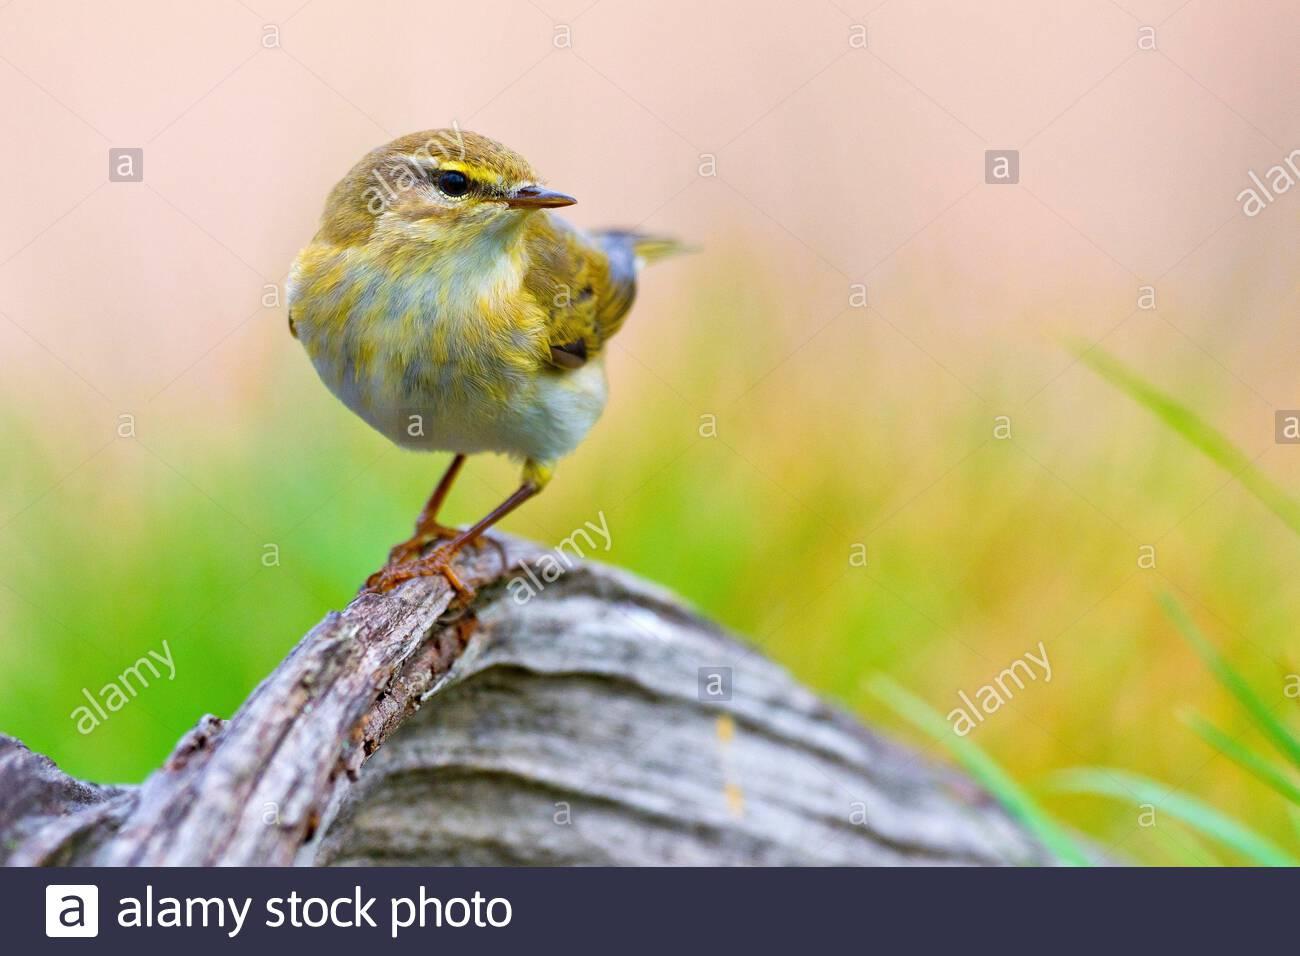 Willow Warbler, Phylloscopus trochilus, Mosquitero Musical, Castilla y León, Spain, Europe. Stock Photo